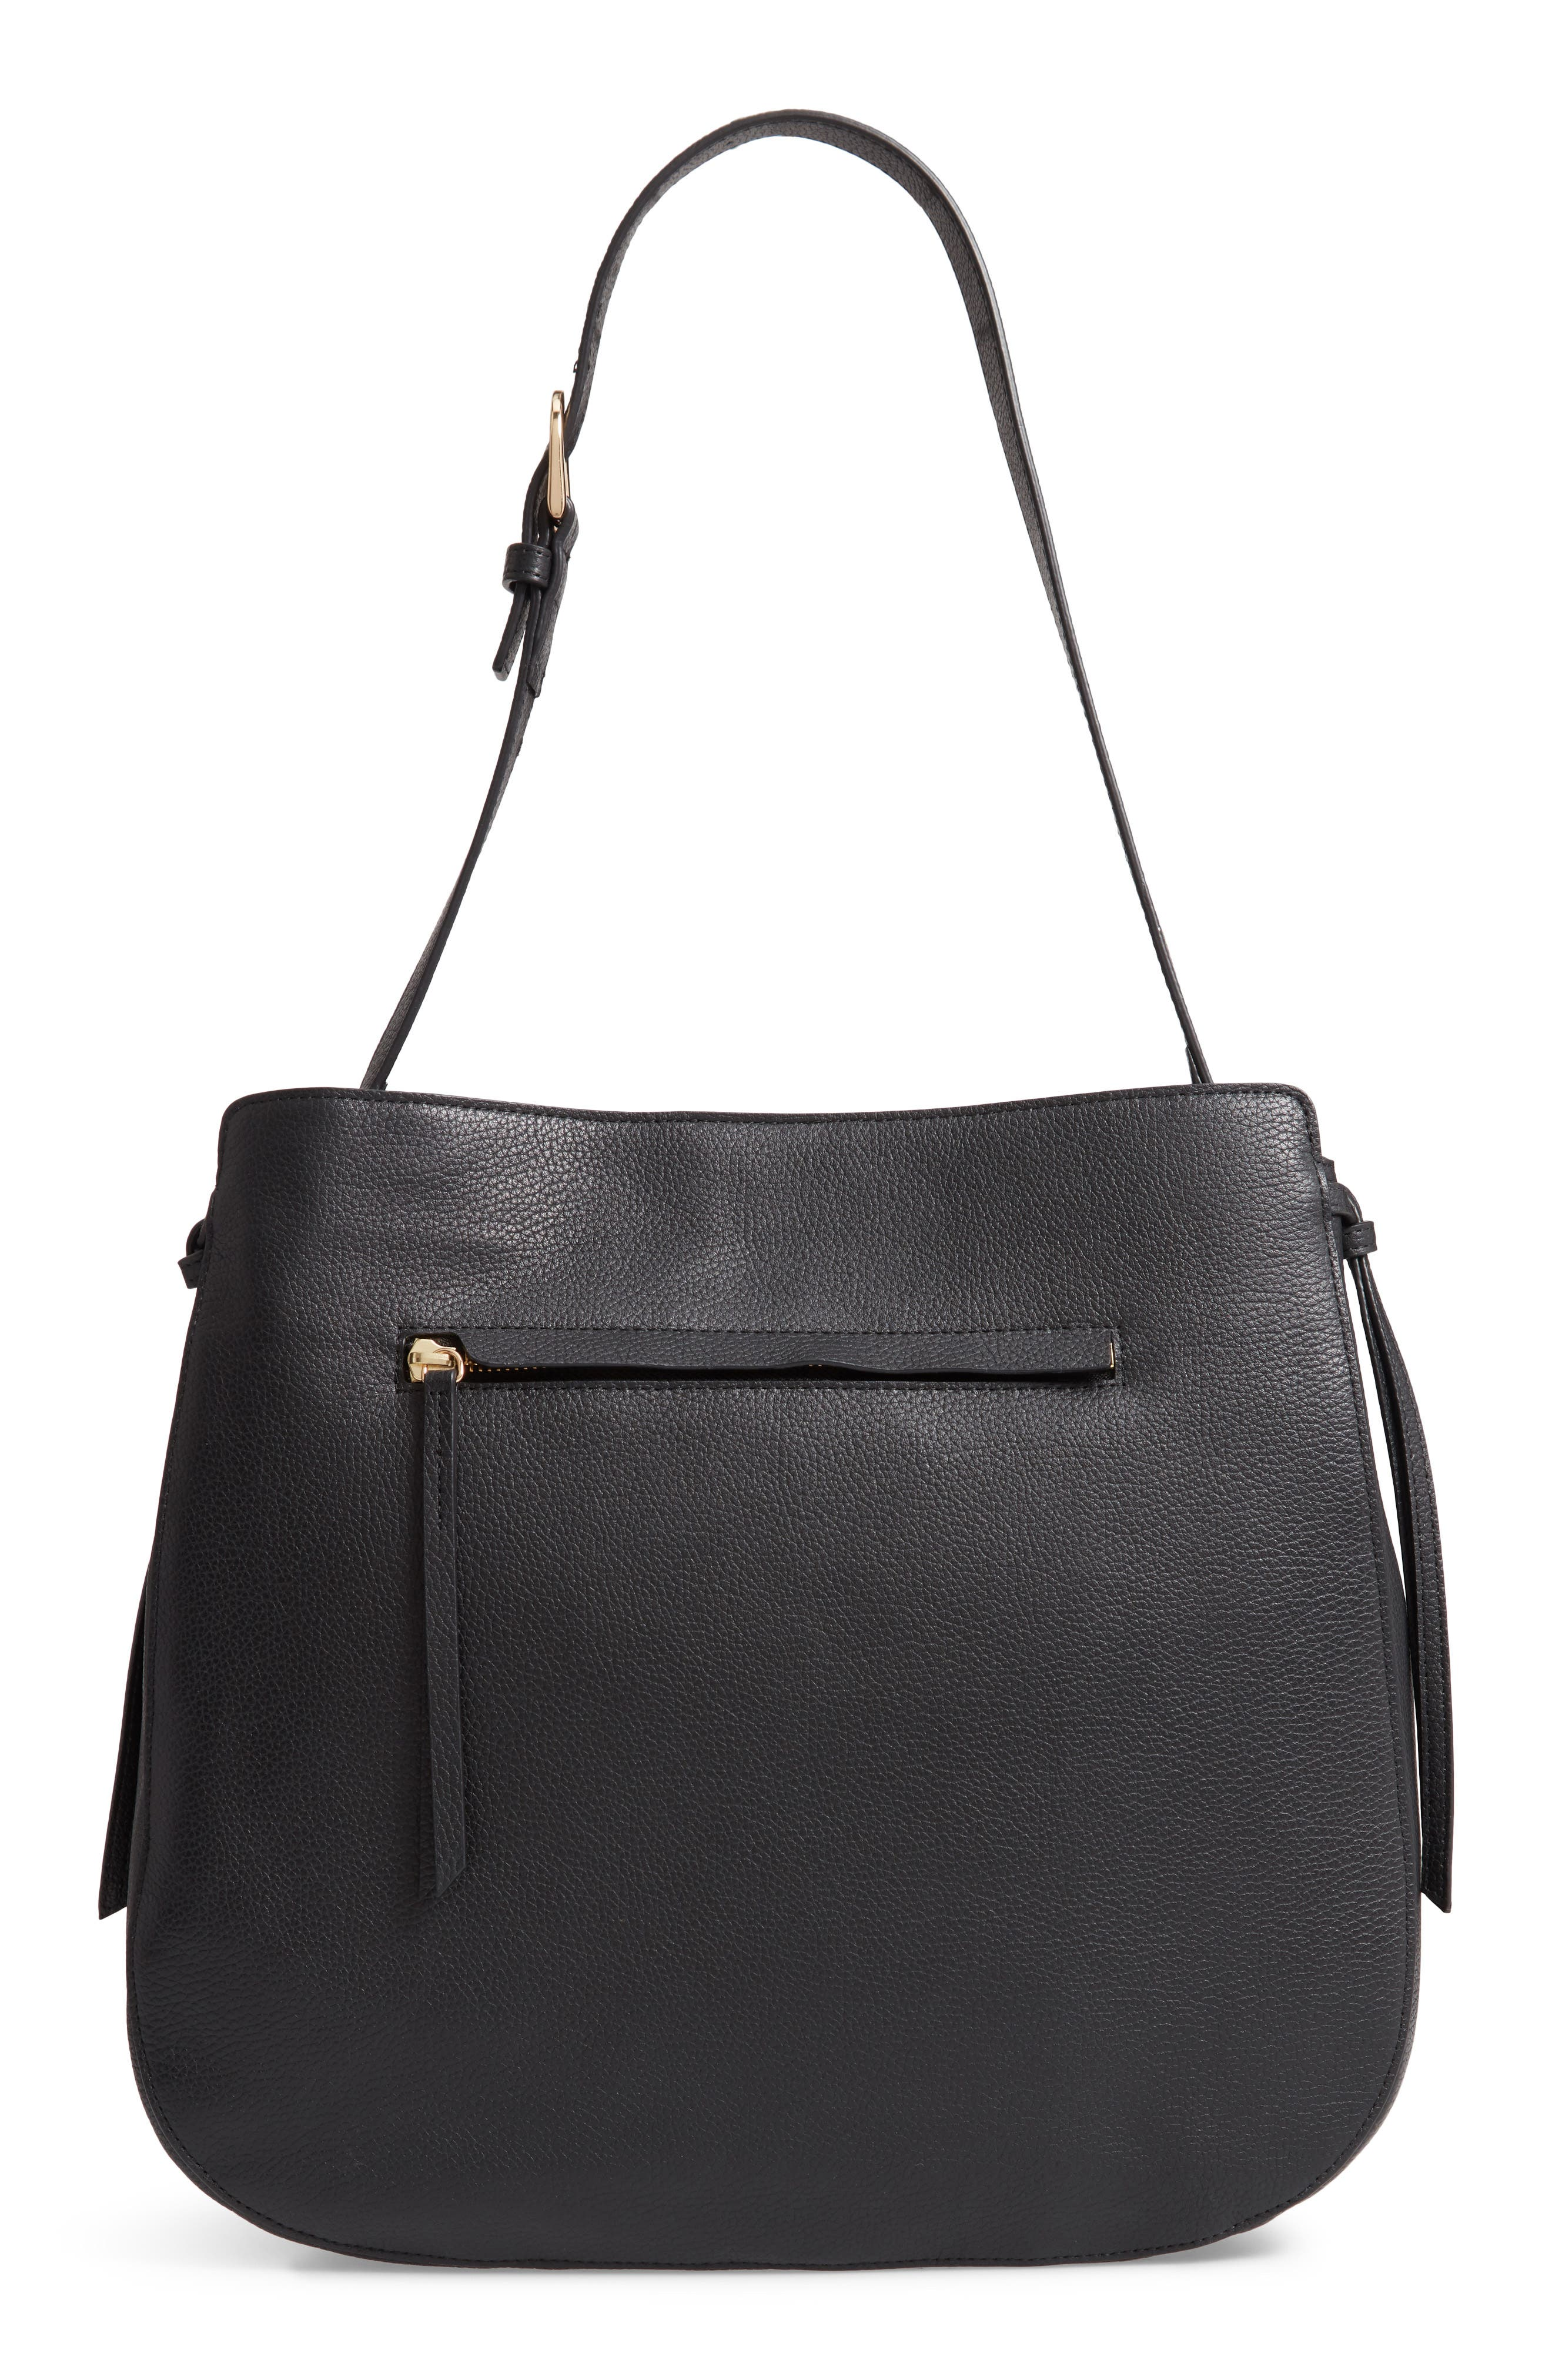 NORDSTROM Finley Leather Hobo, Main, color, BLACK